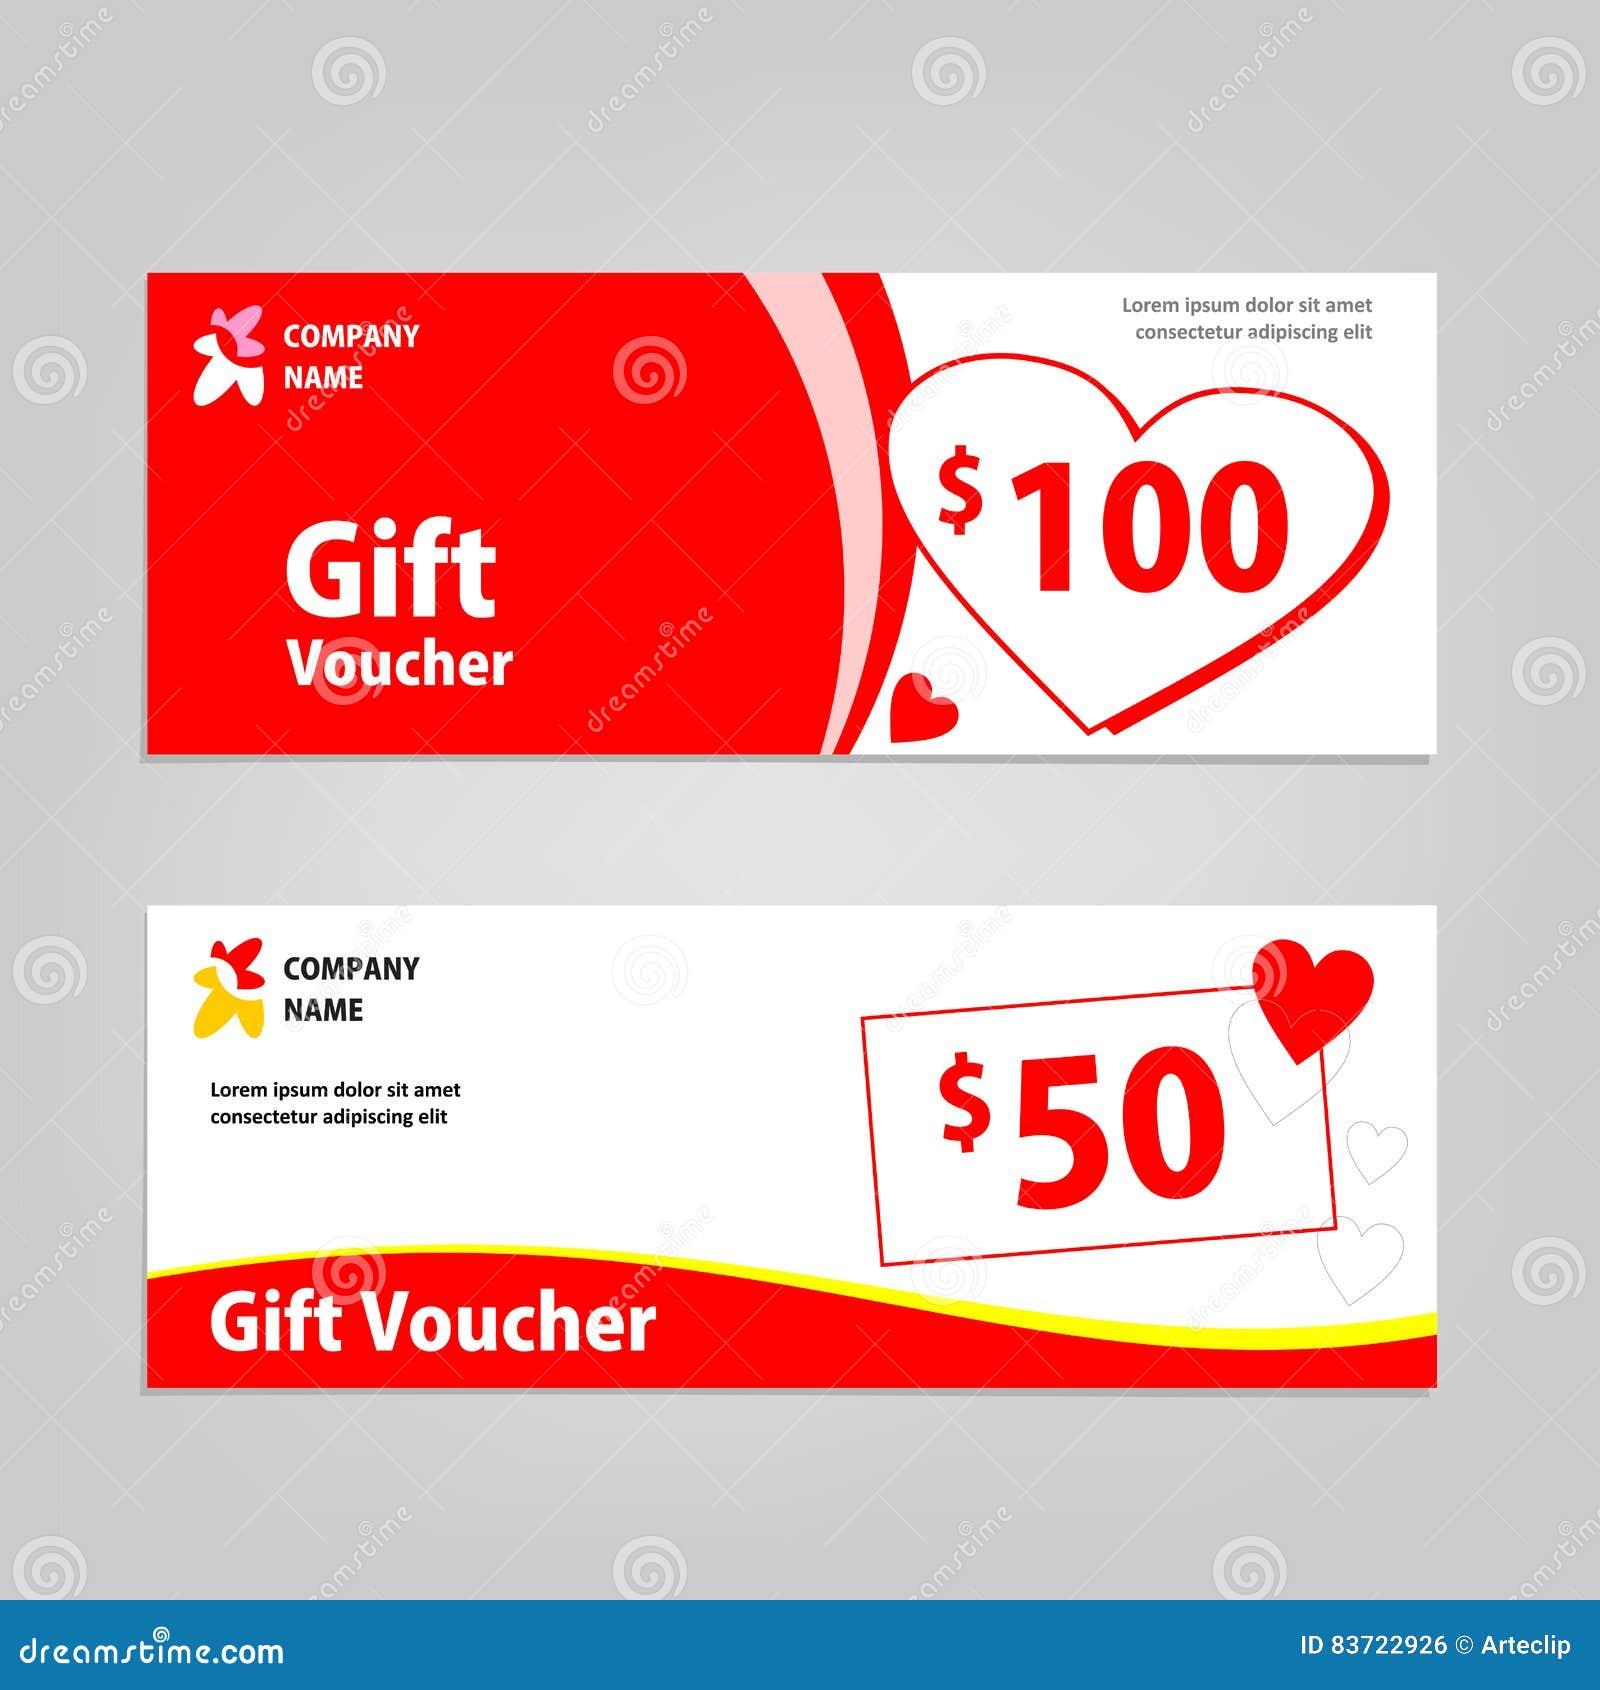 Gift Voucher Template For Valentine Promo Stock Illustration